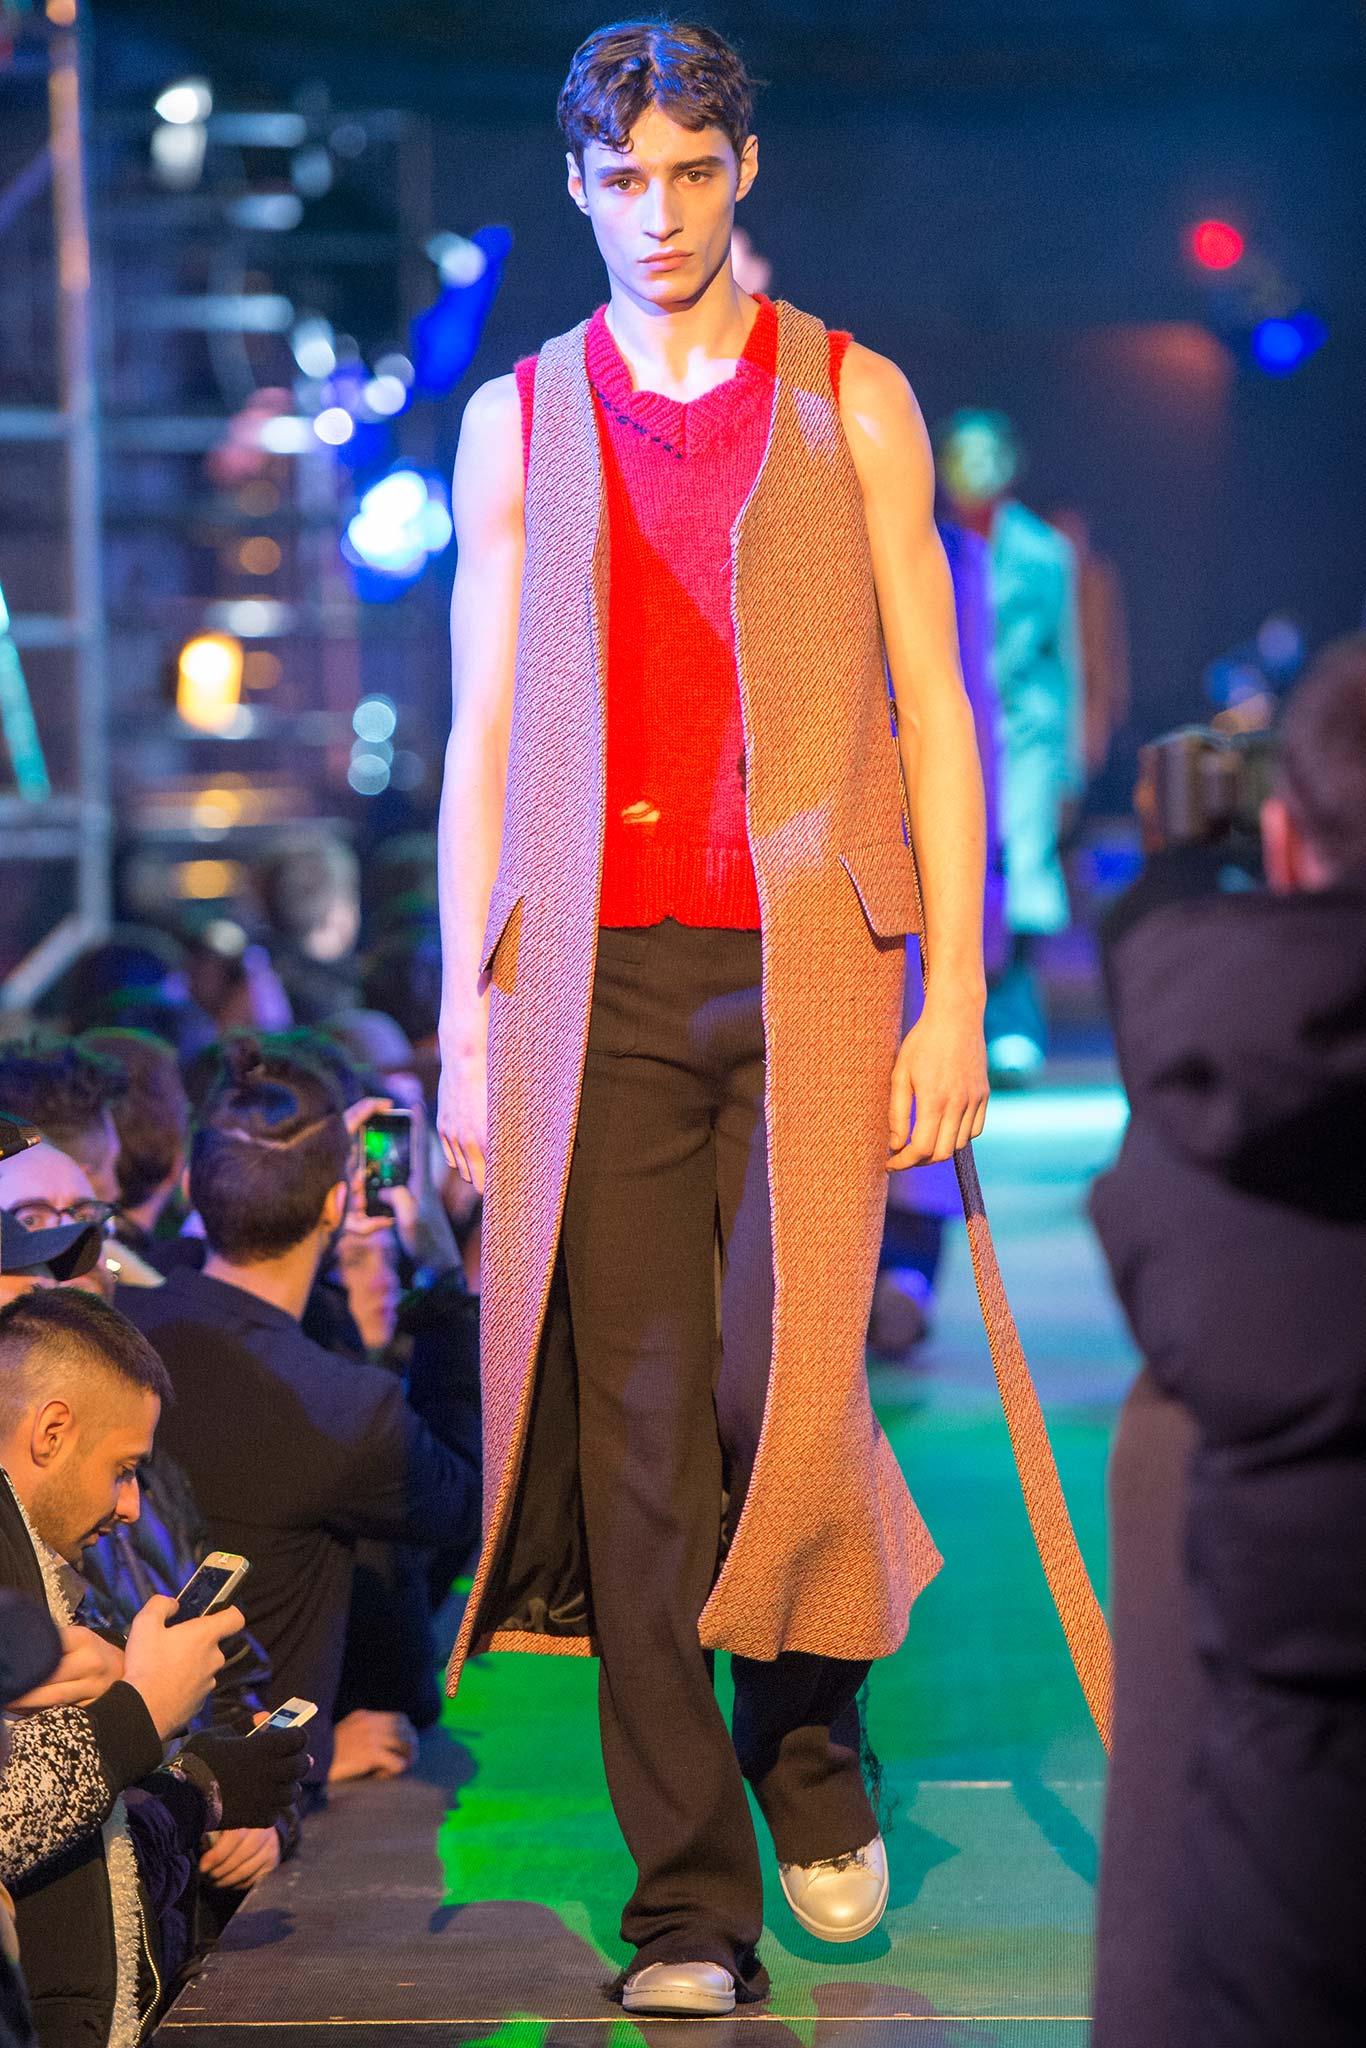 Raf Simons Menswear FW 2015 Paris